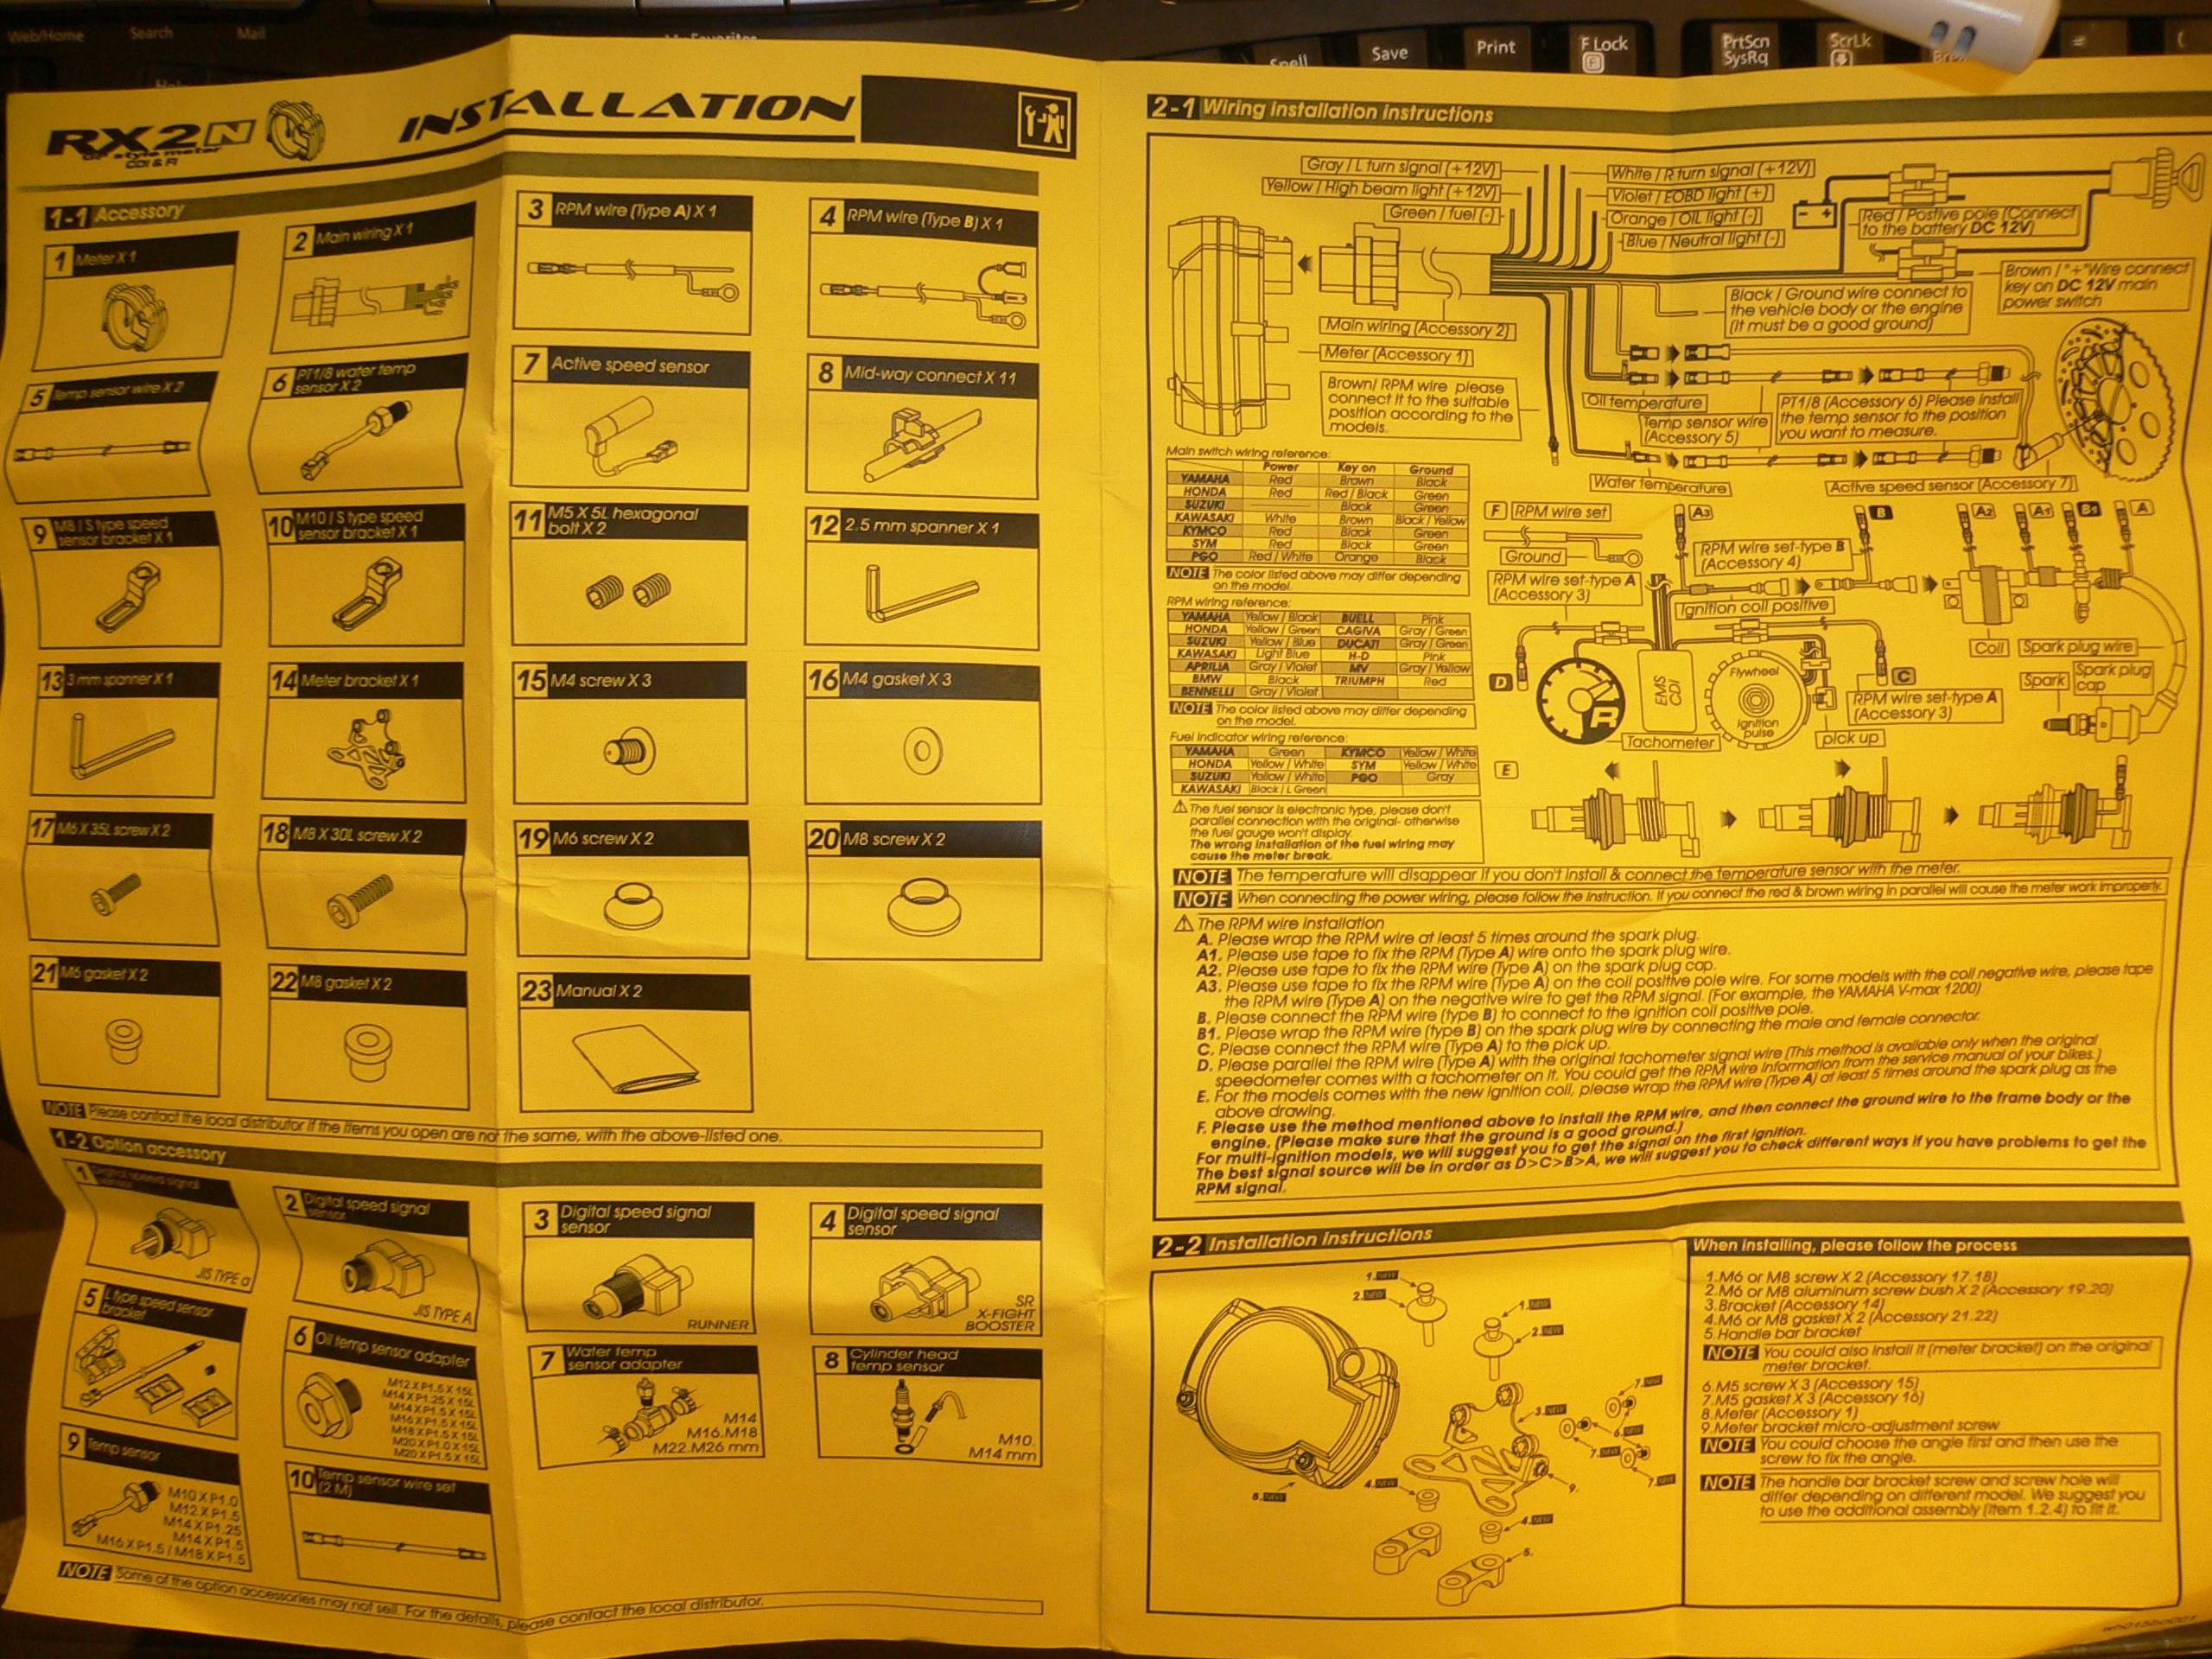 case 470 wiring diagram koso rx2n  zetec omex  koso rx2n  zetec omex